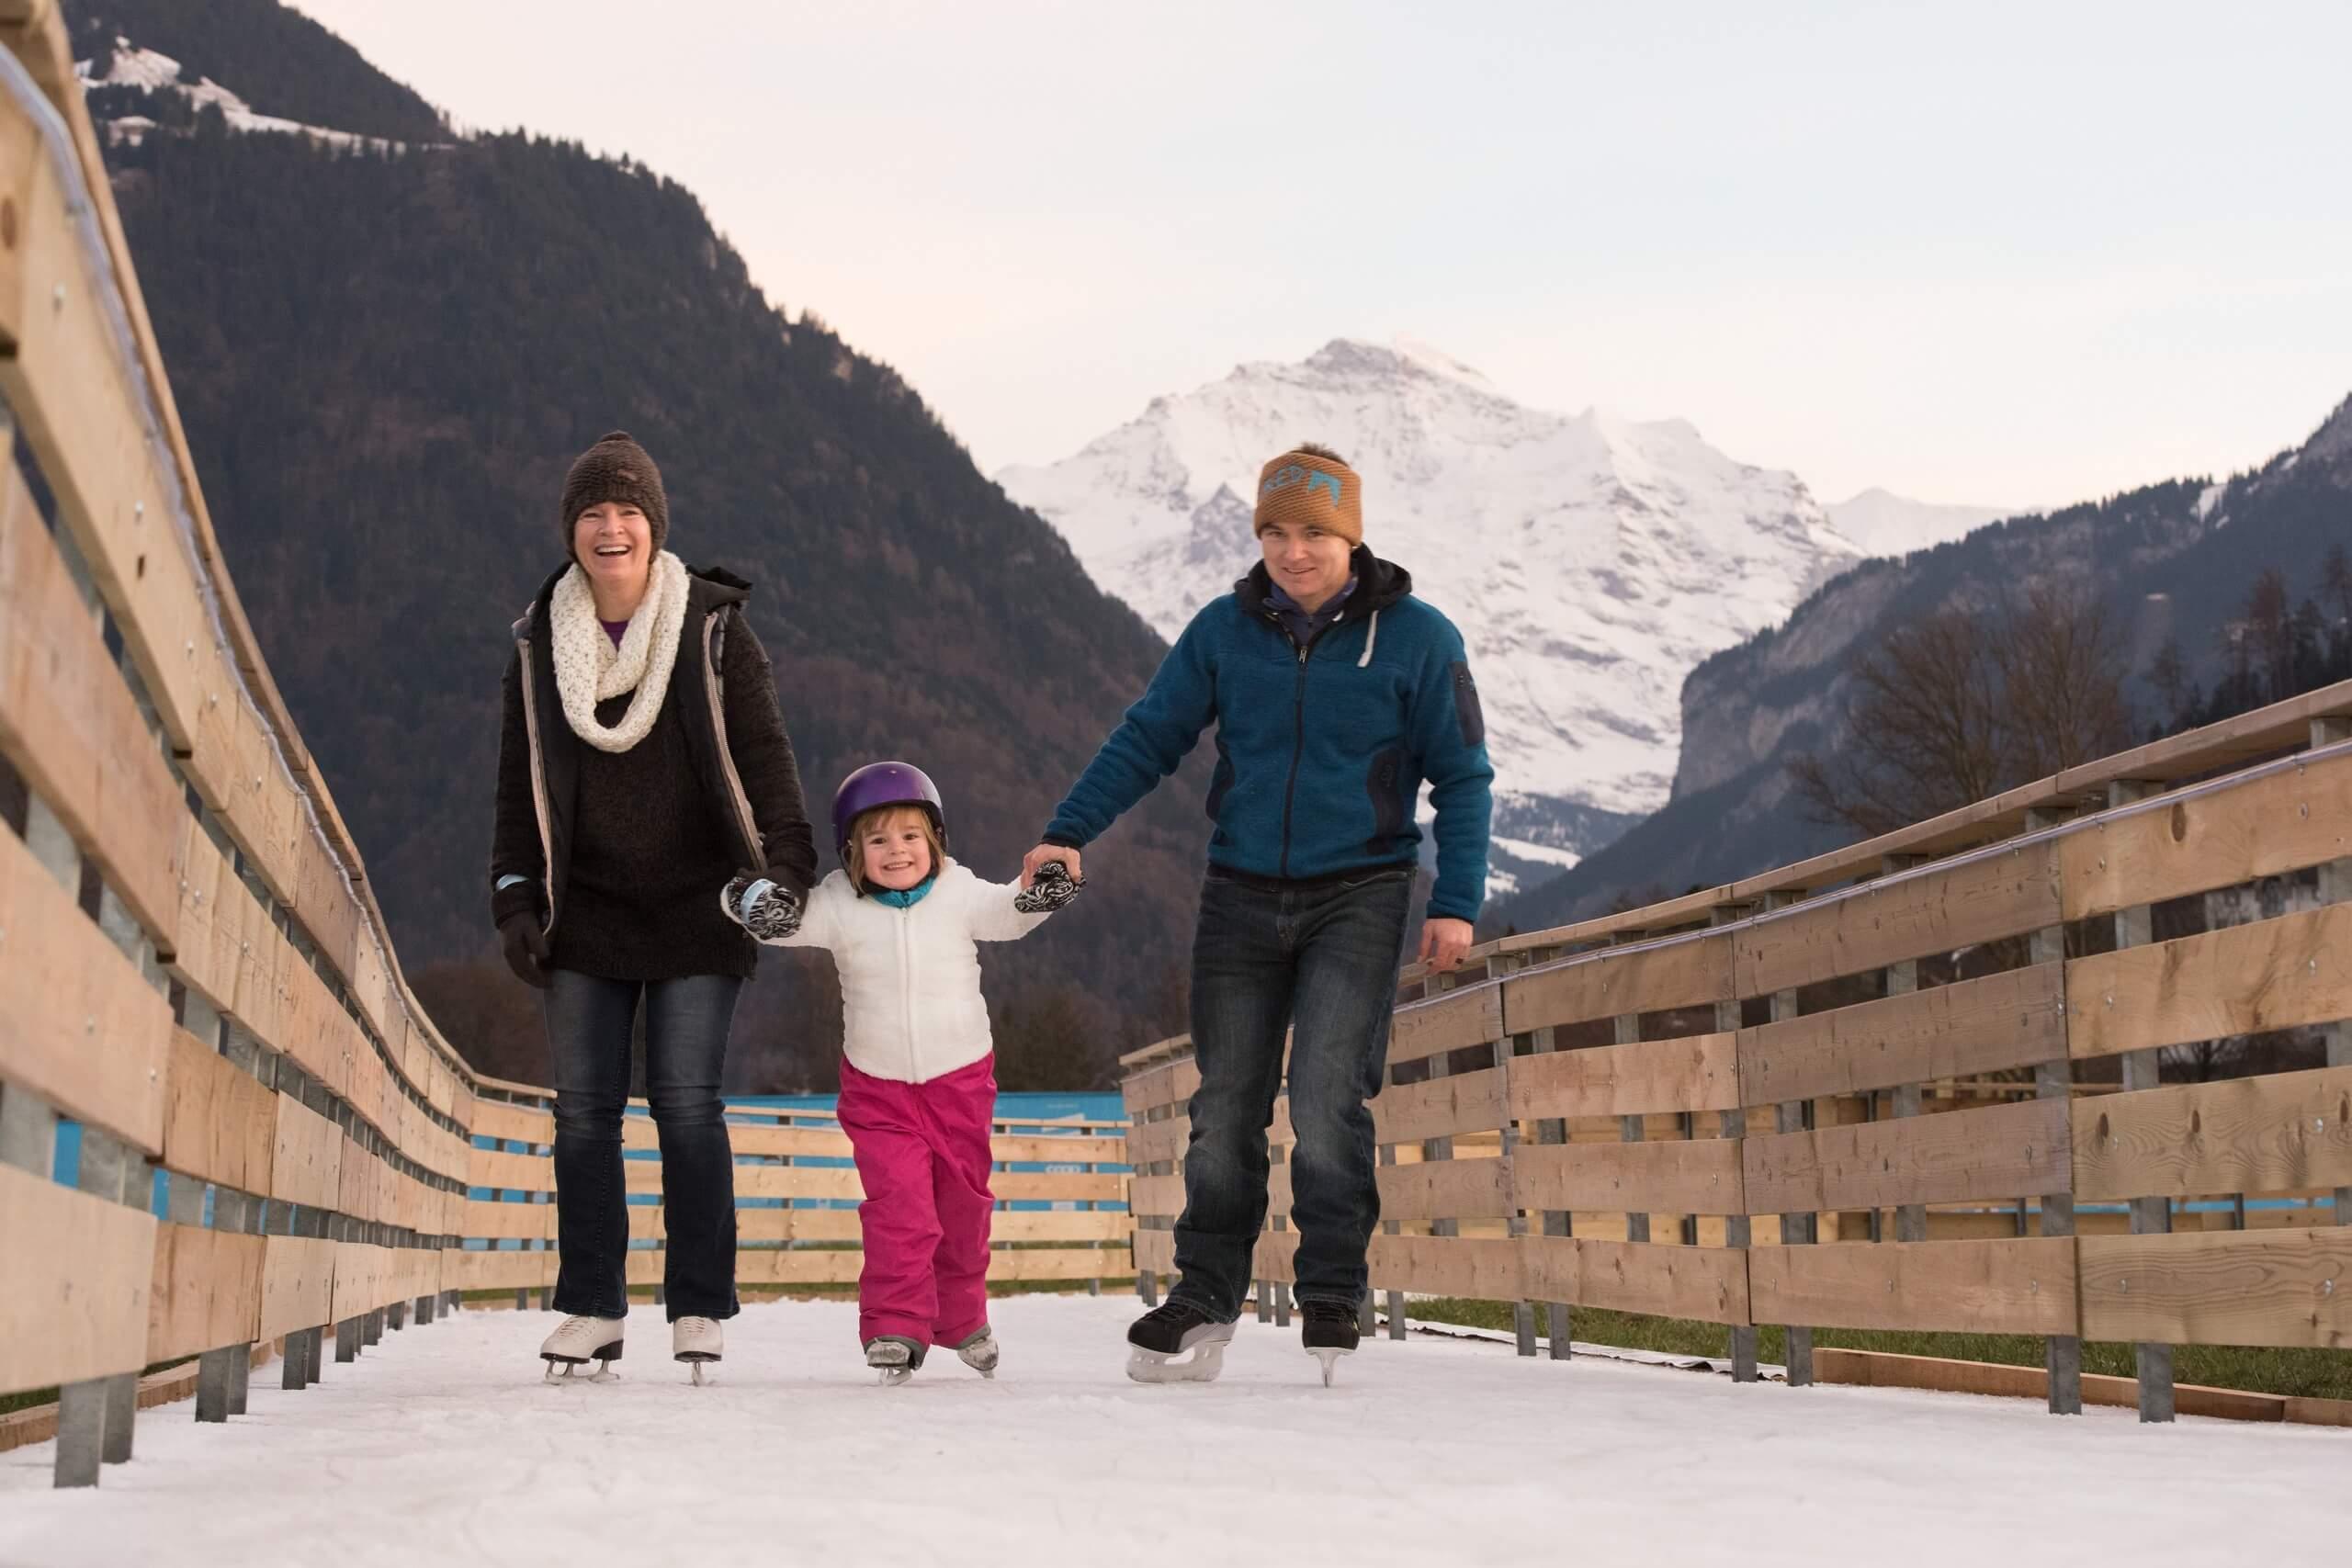 interlaken-top-of-europe-ice-magic-familie-schlittschuhlaufen-winter-eisweg-jungfrau-winterevents